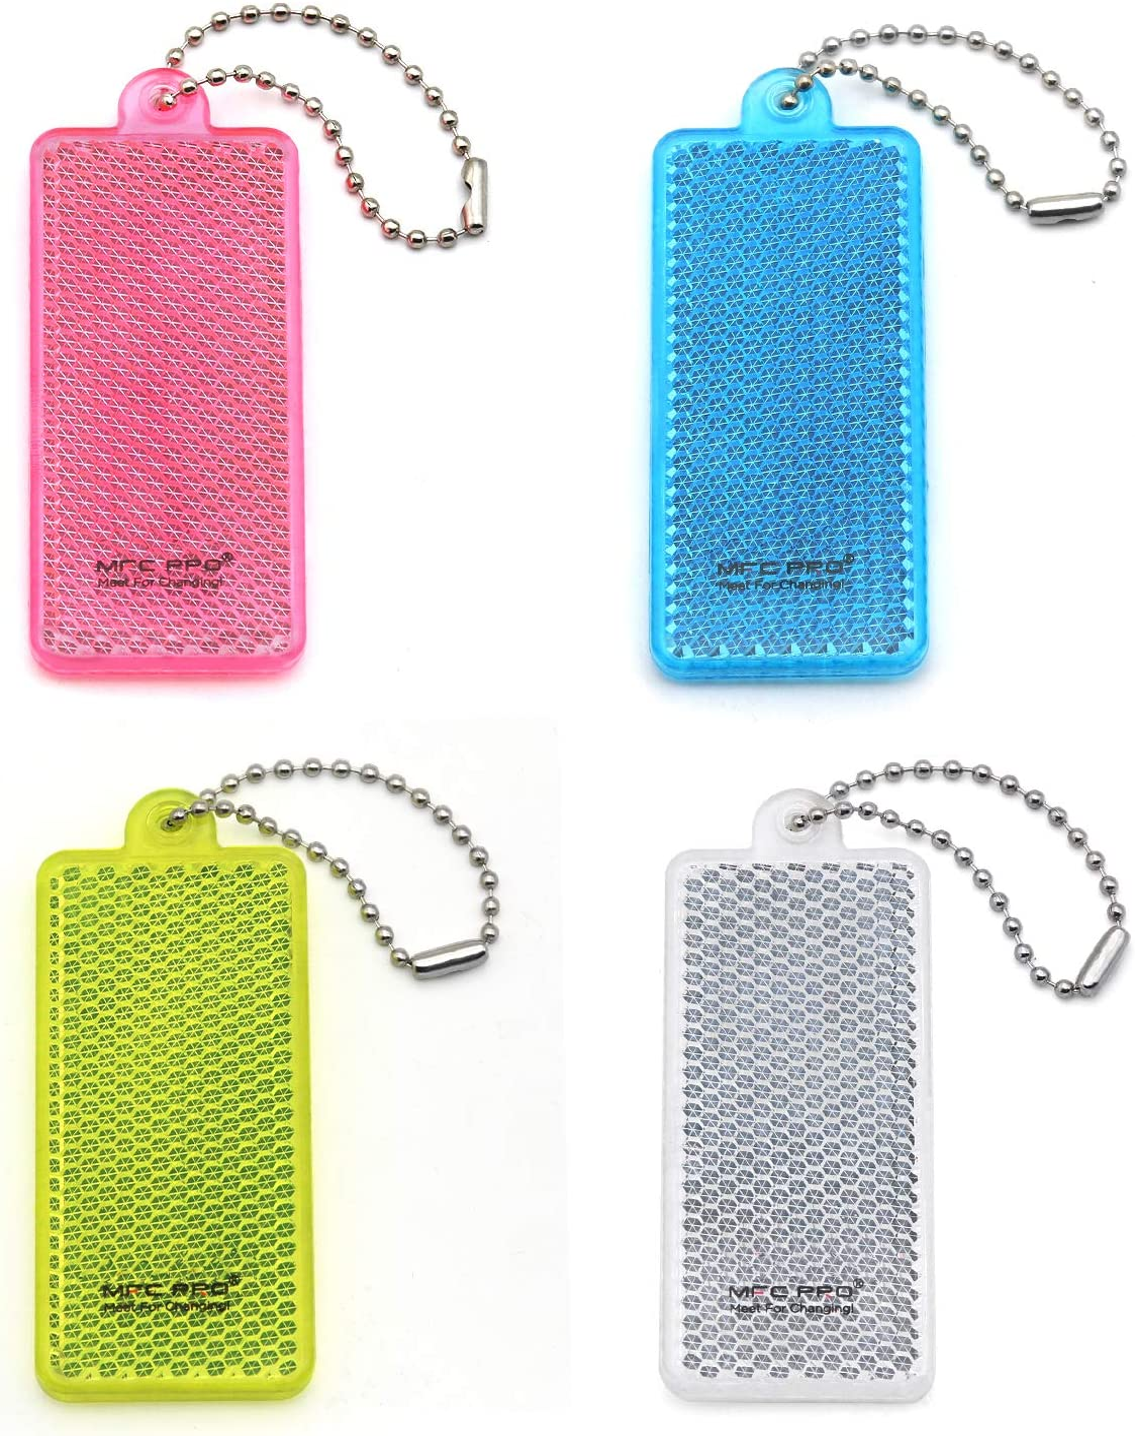 4Pcs Super Bright Children's Stylis New product!! Gear Reflective Safety Award-winning store